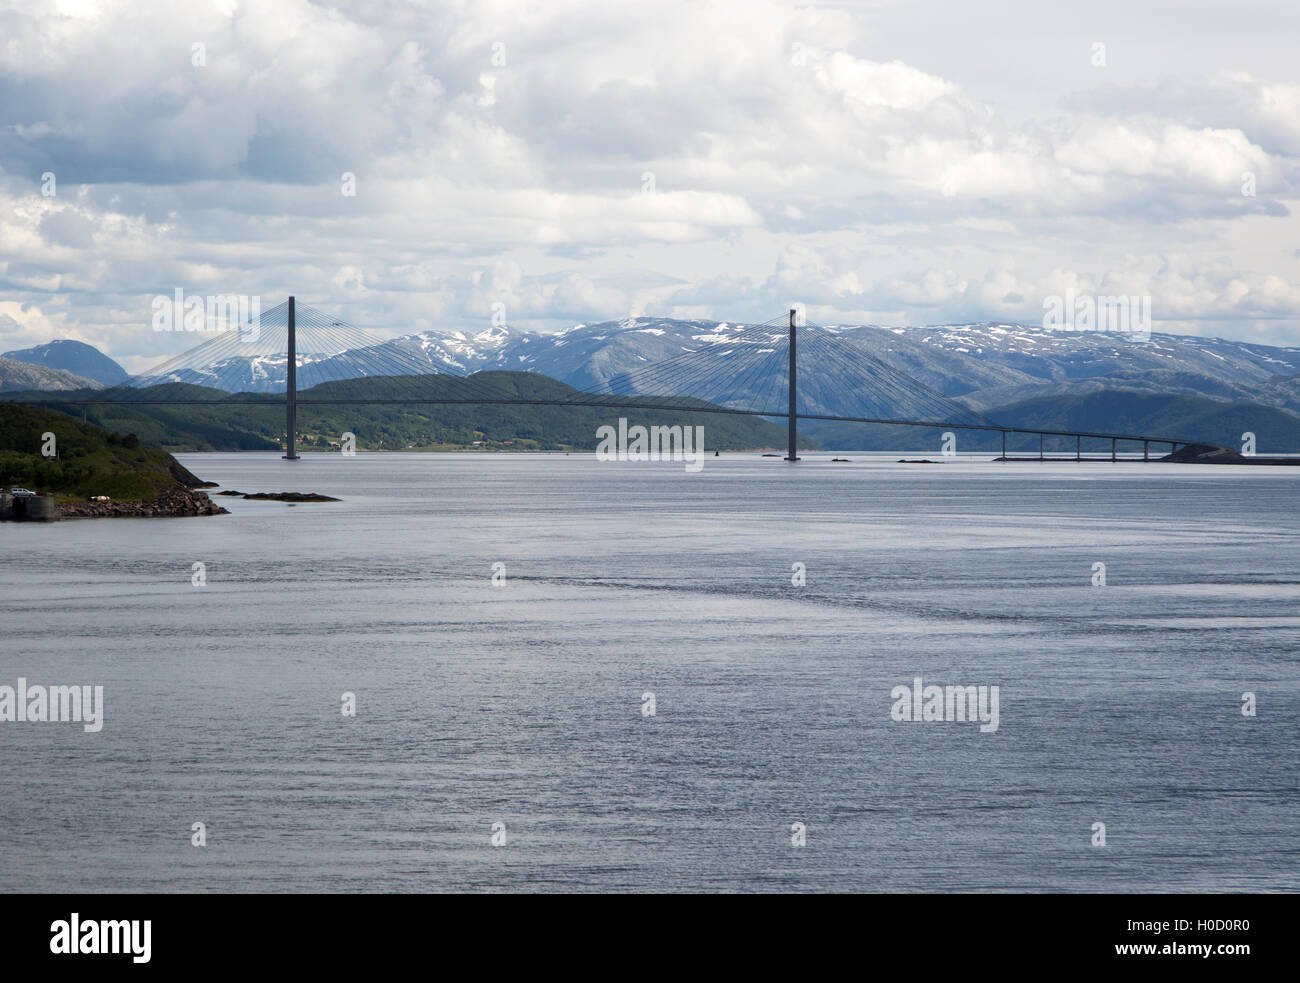 Large concrete cantilever road bridge crossing fiord at Sandnessjoen, Nordland, Norway - Stock Image